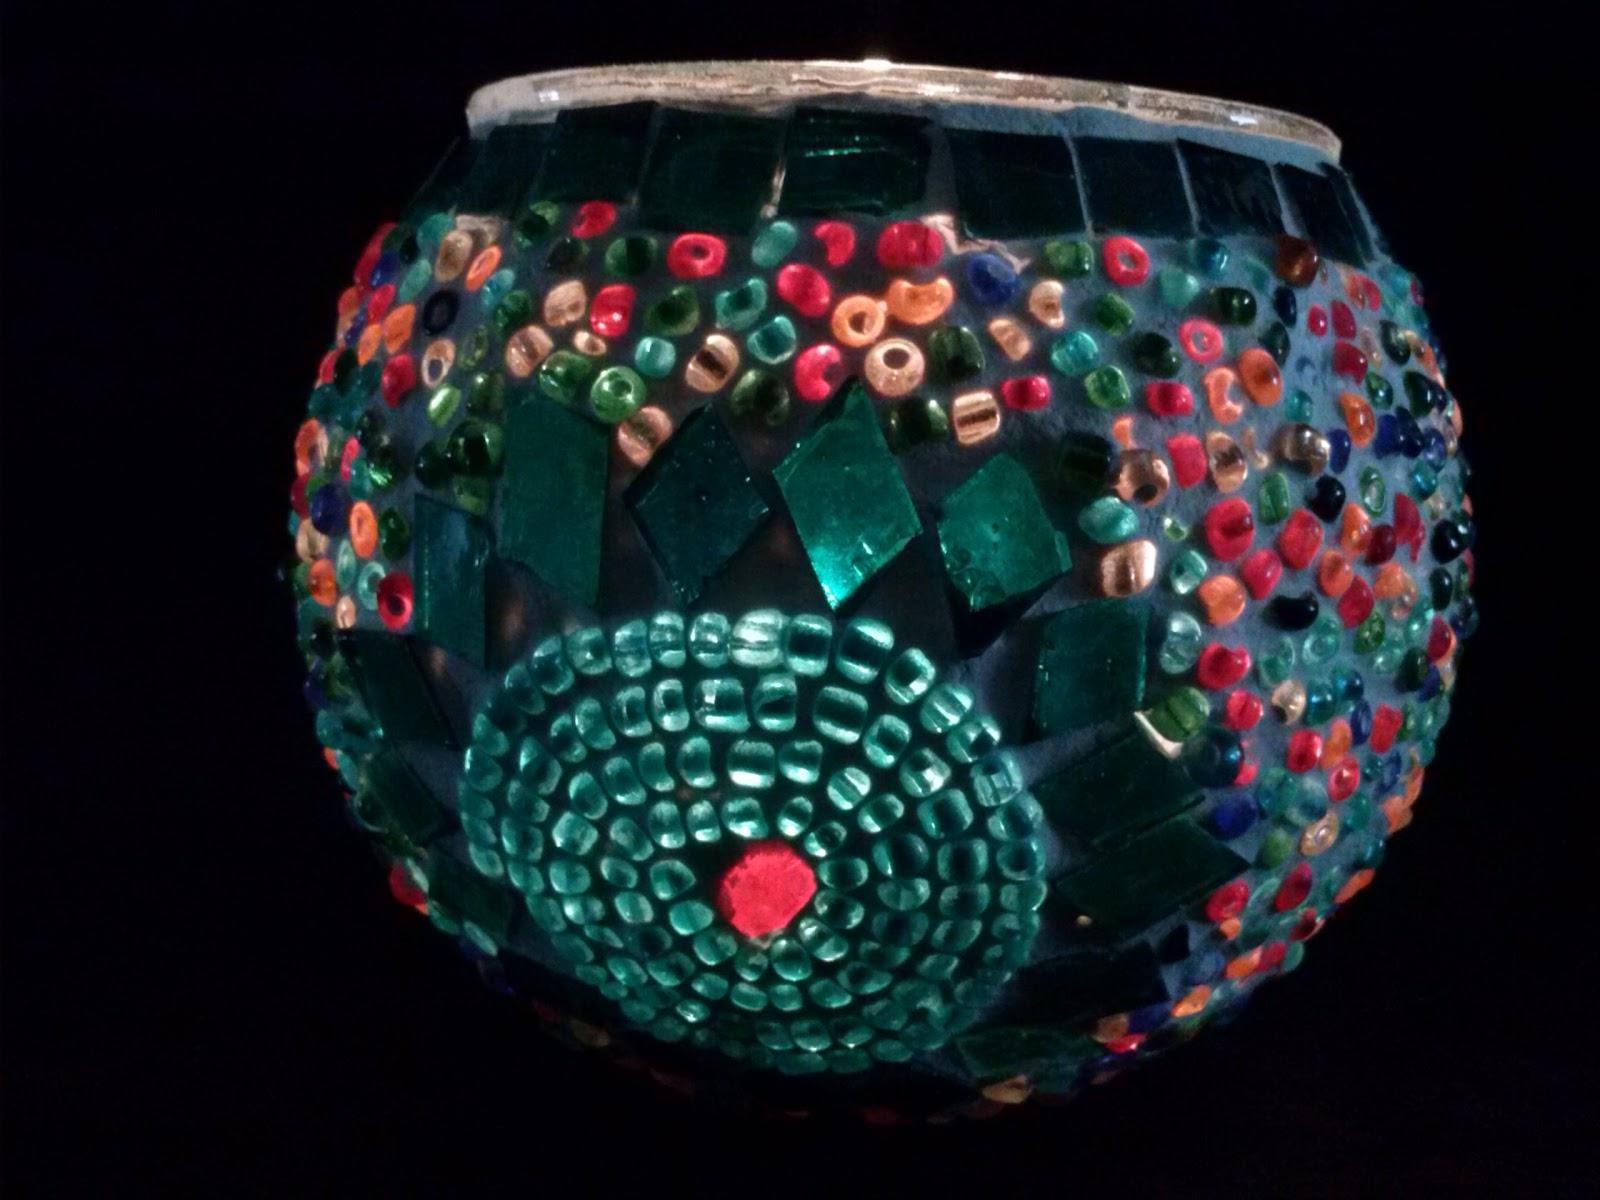 Lamparas de turquia decoracion india portavelas turcos - Lamparas de decoracion ...